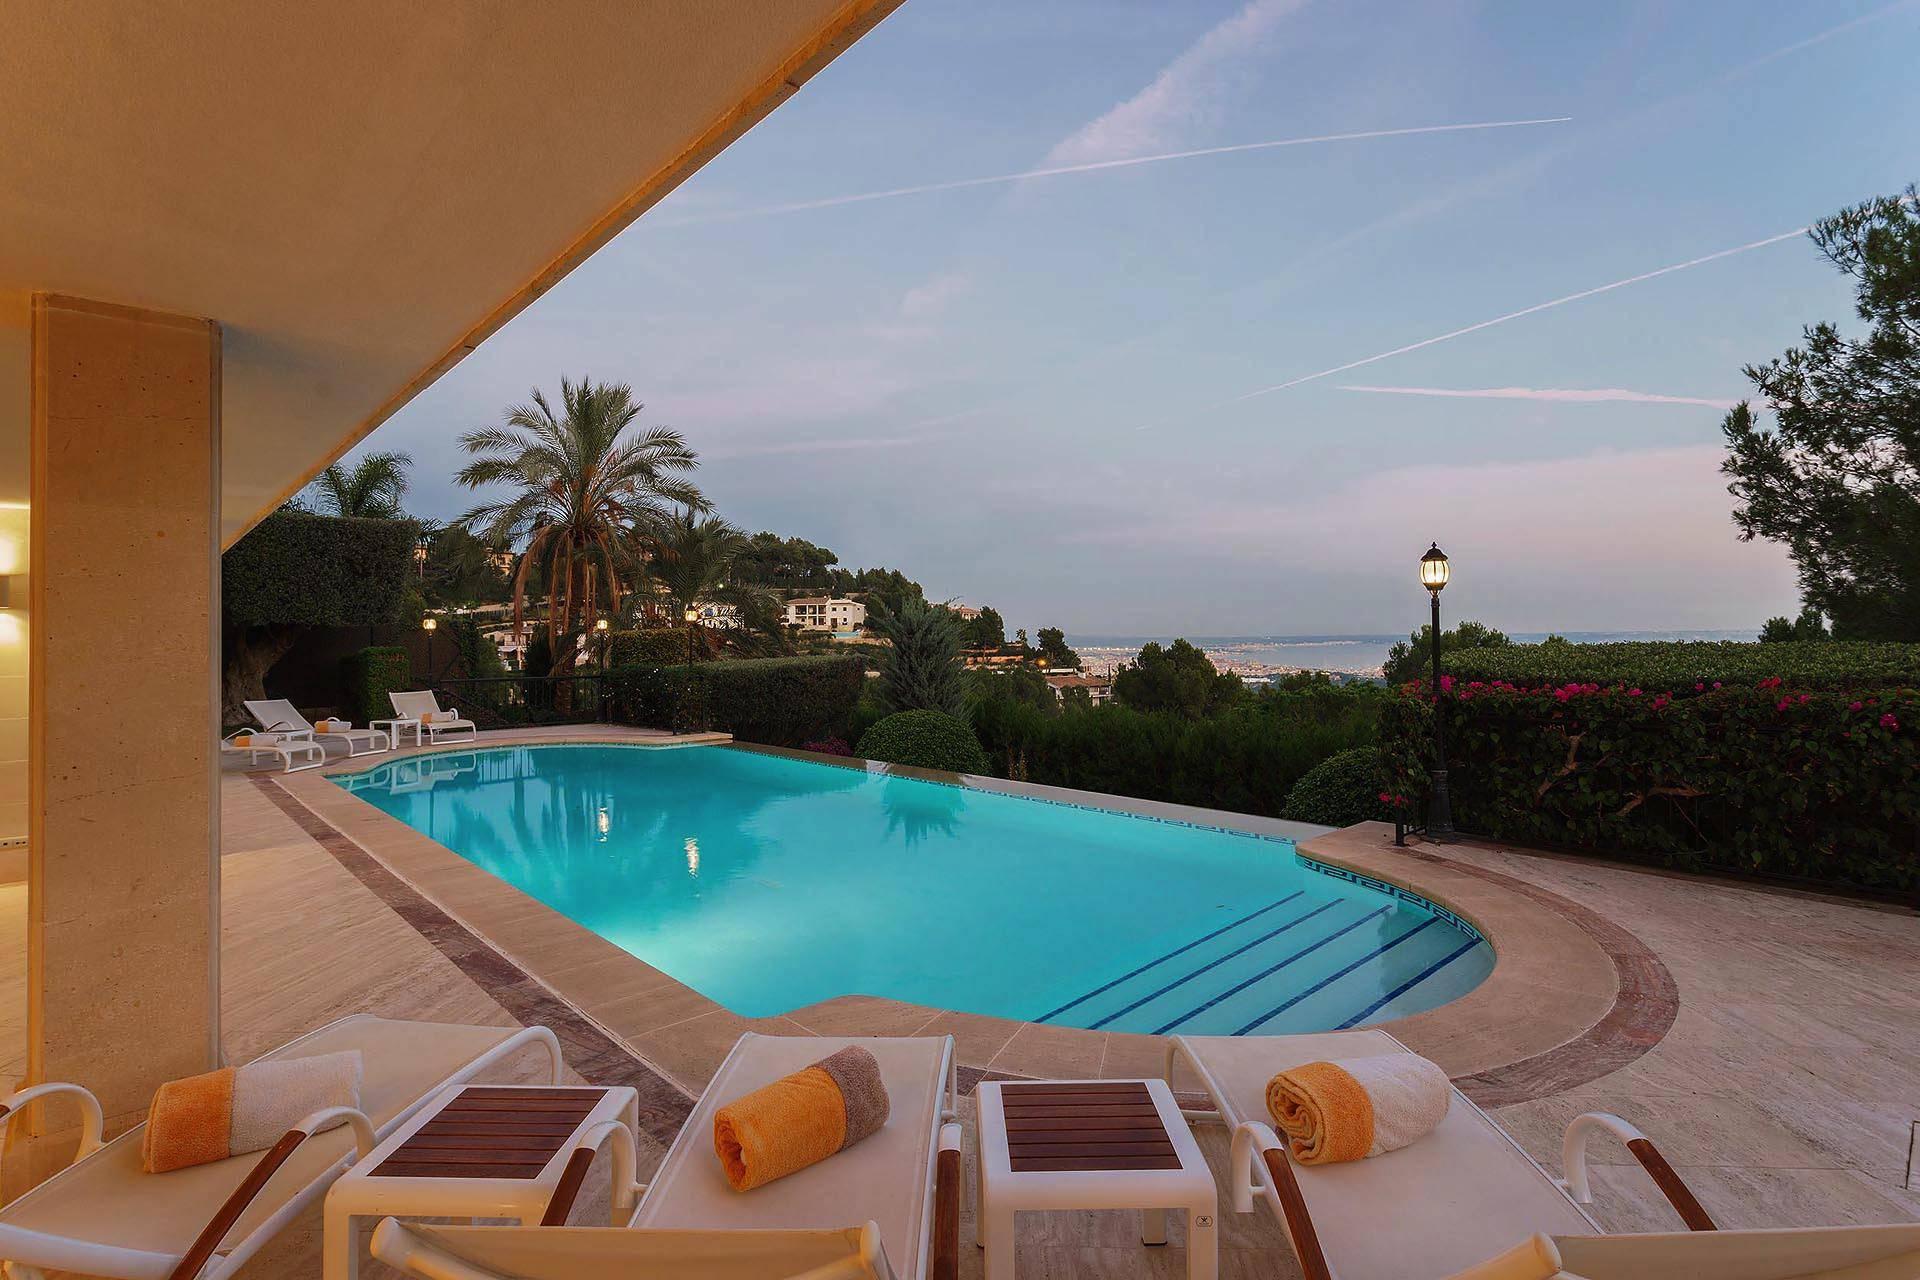 01-280 großzügige Villa nahe Palma de Mallorca Bild 16